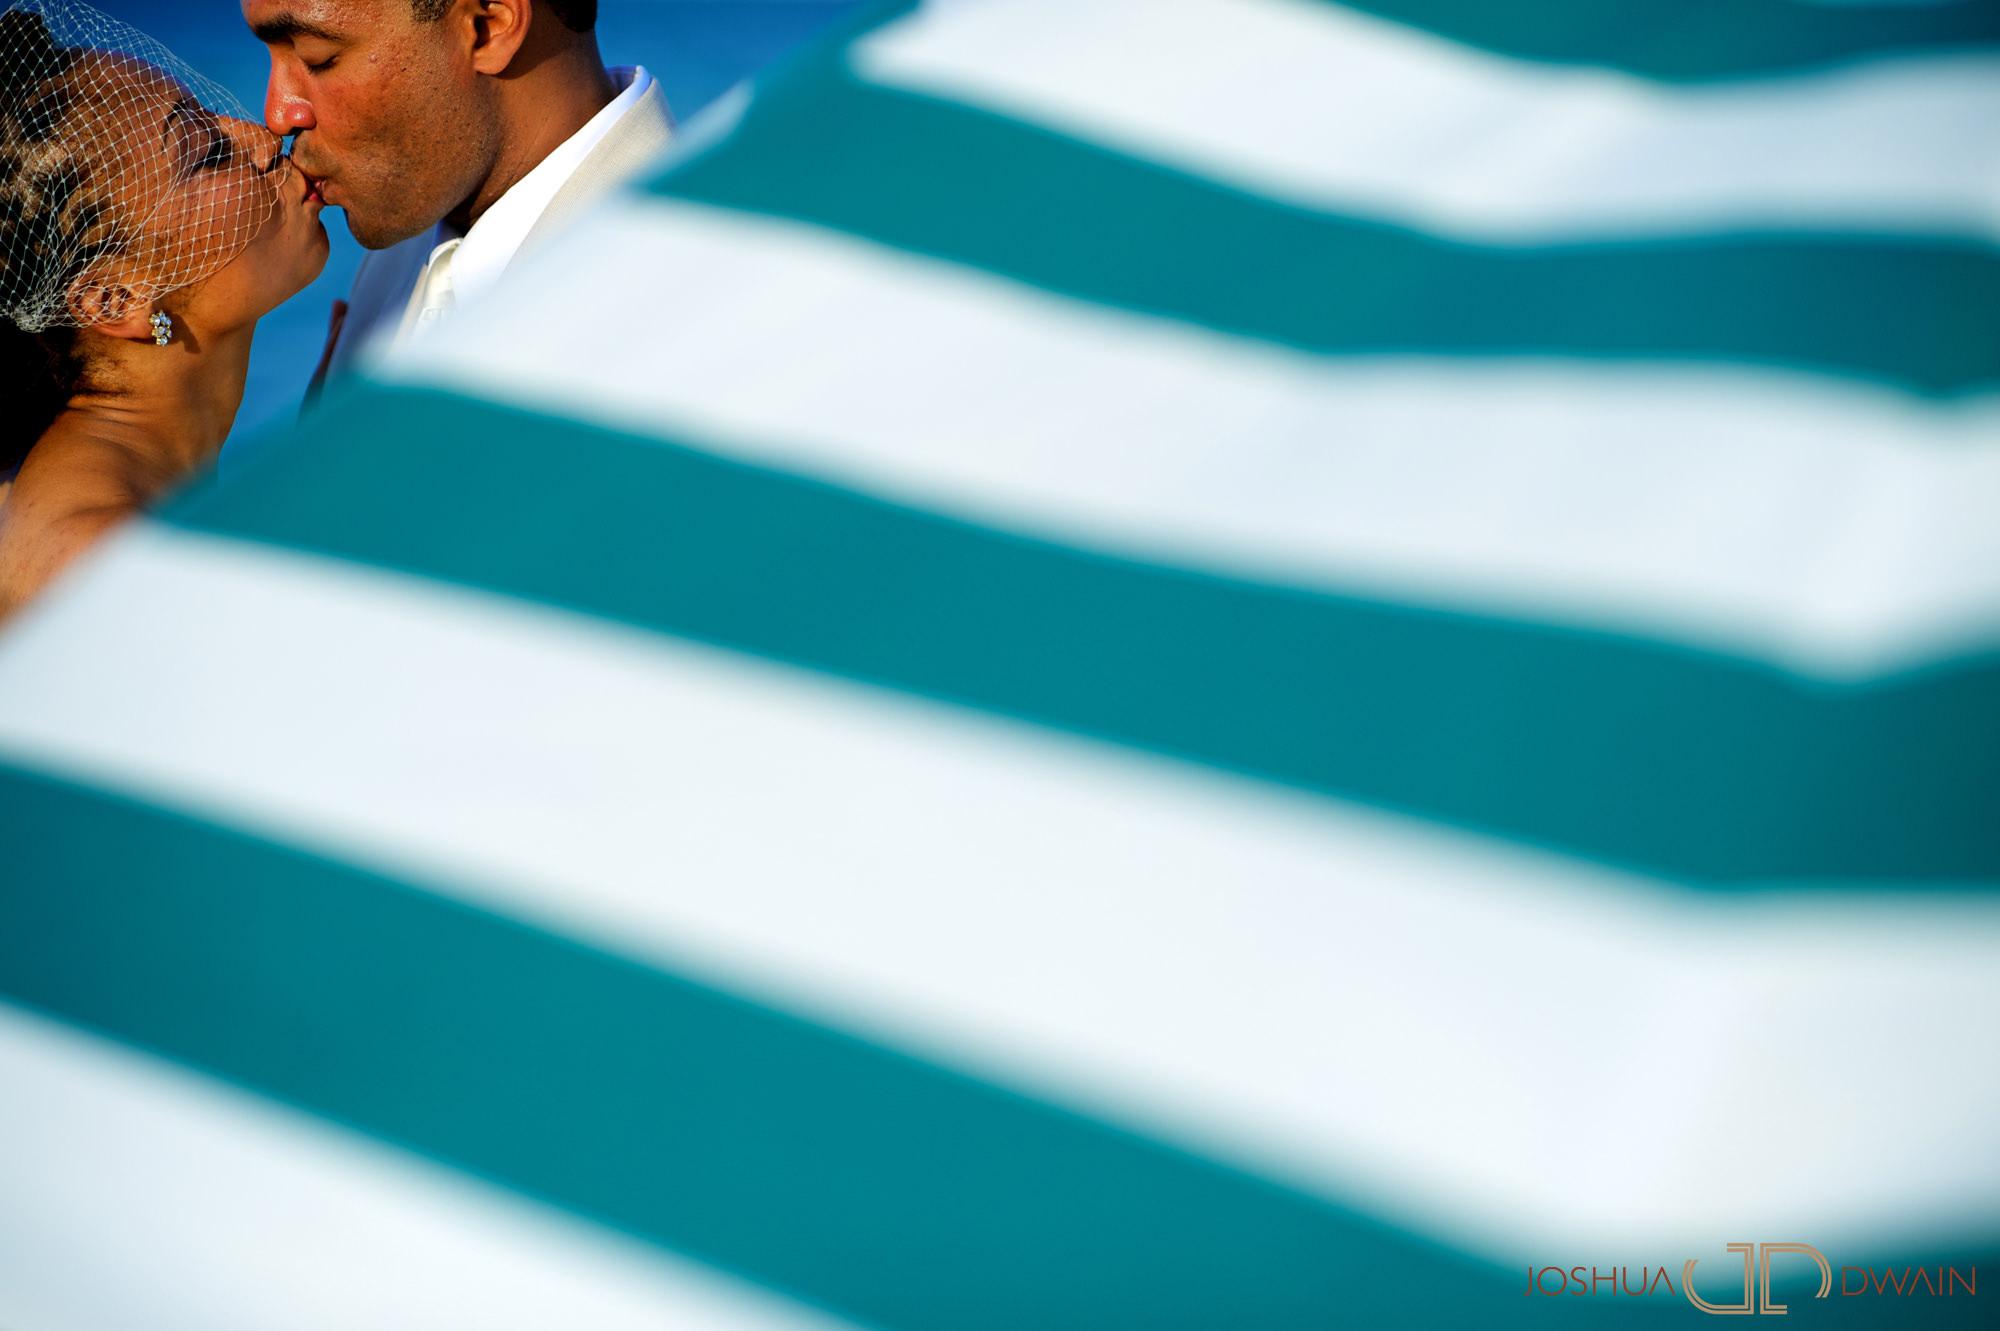 candra-alonza-009-holiday-inn-south-beach-miami-wedding-photographer-joshua-dwain-2012-07-28_ca_229